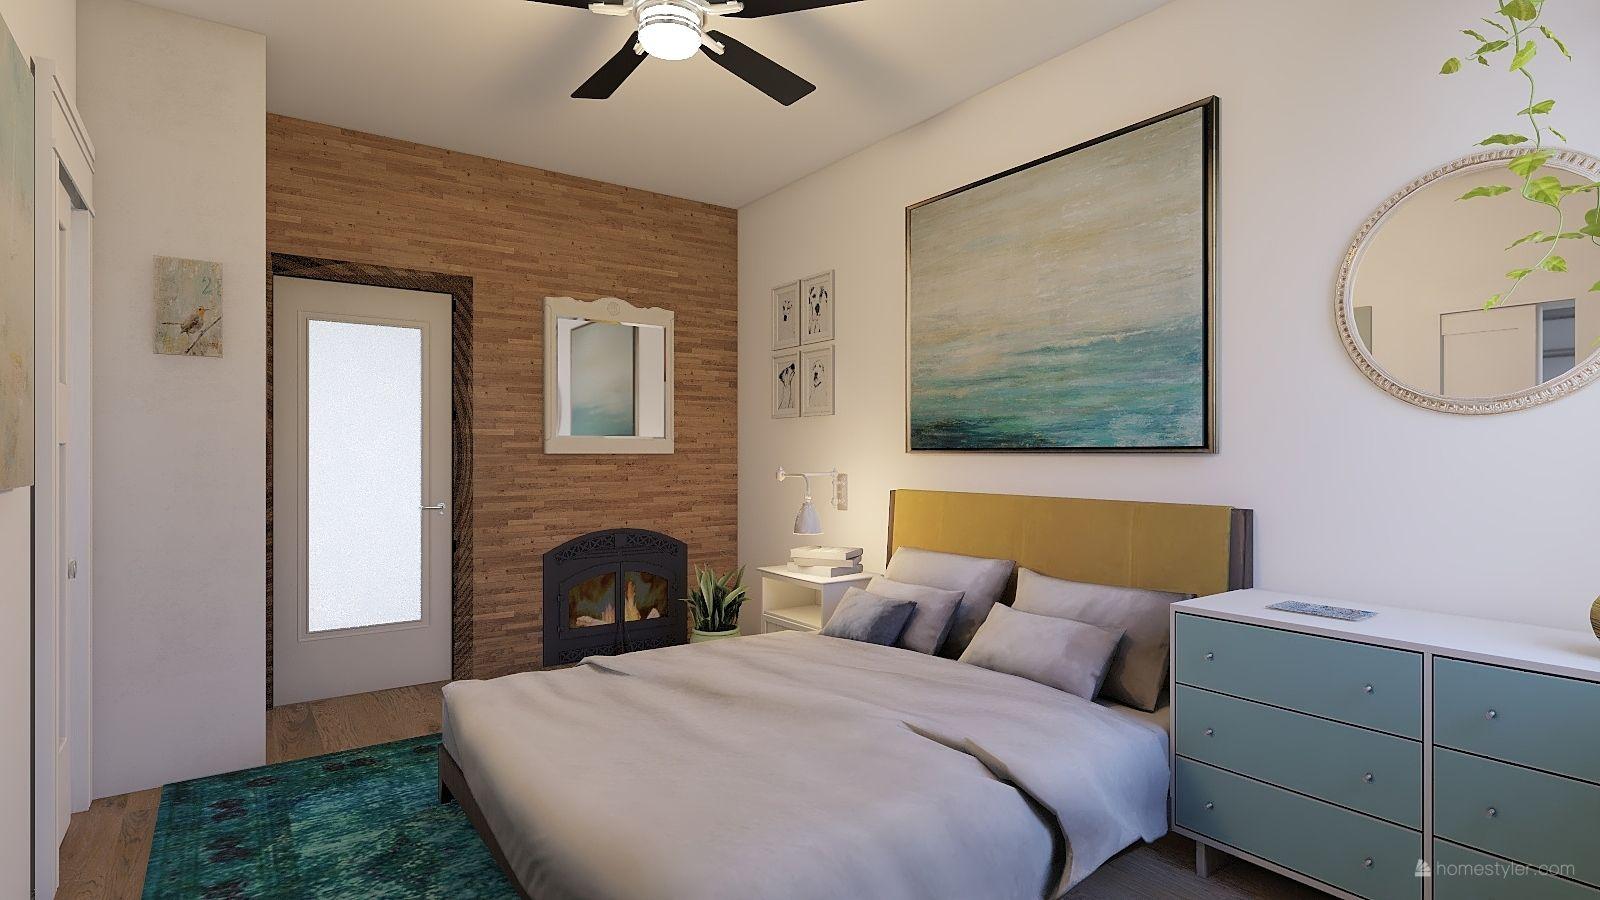 Bedroom Design By J T Interiordesign Bedroom Decor 3d Home